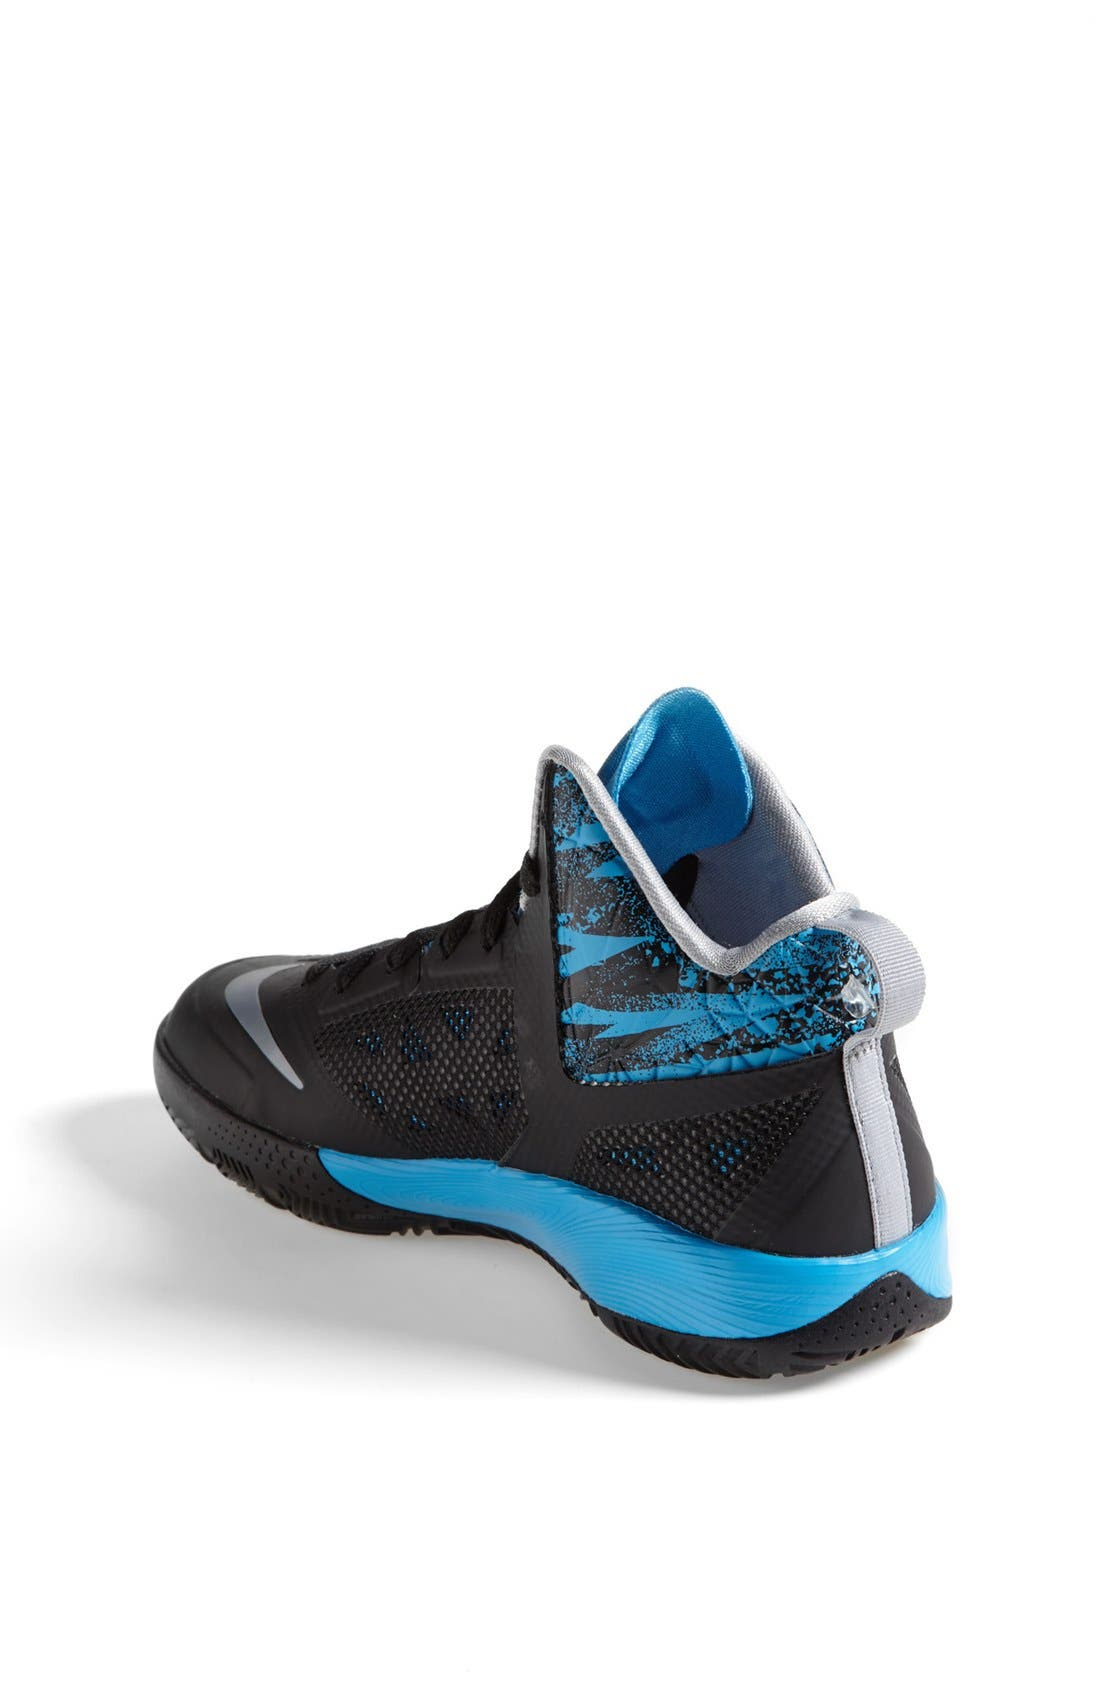 Alternate Image 2  - Nike 'Hyperfuse 2013' Basketball Shoe (Big Kid)